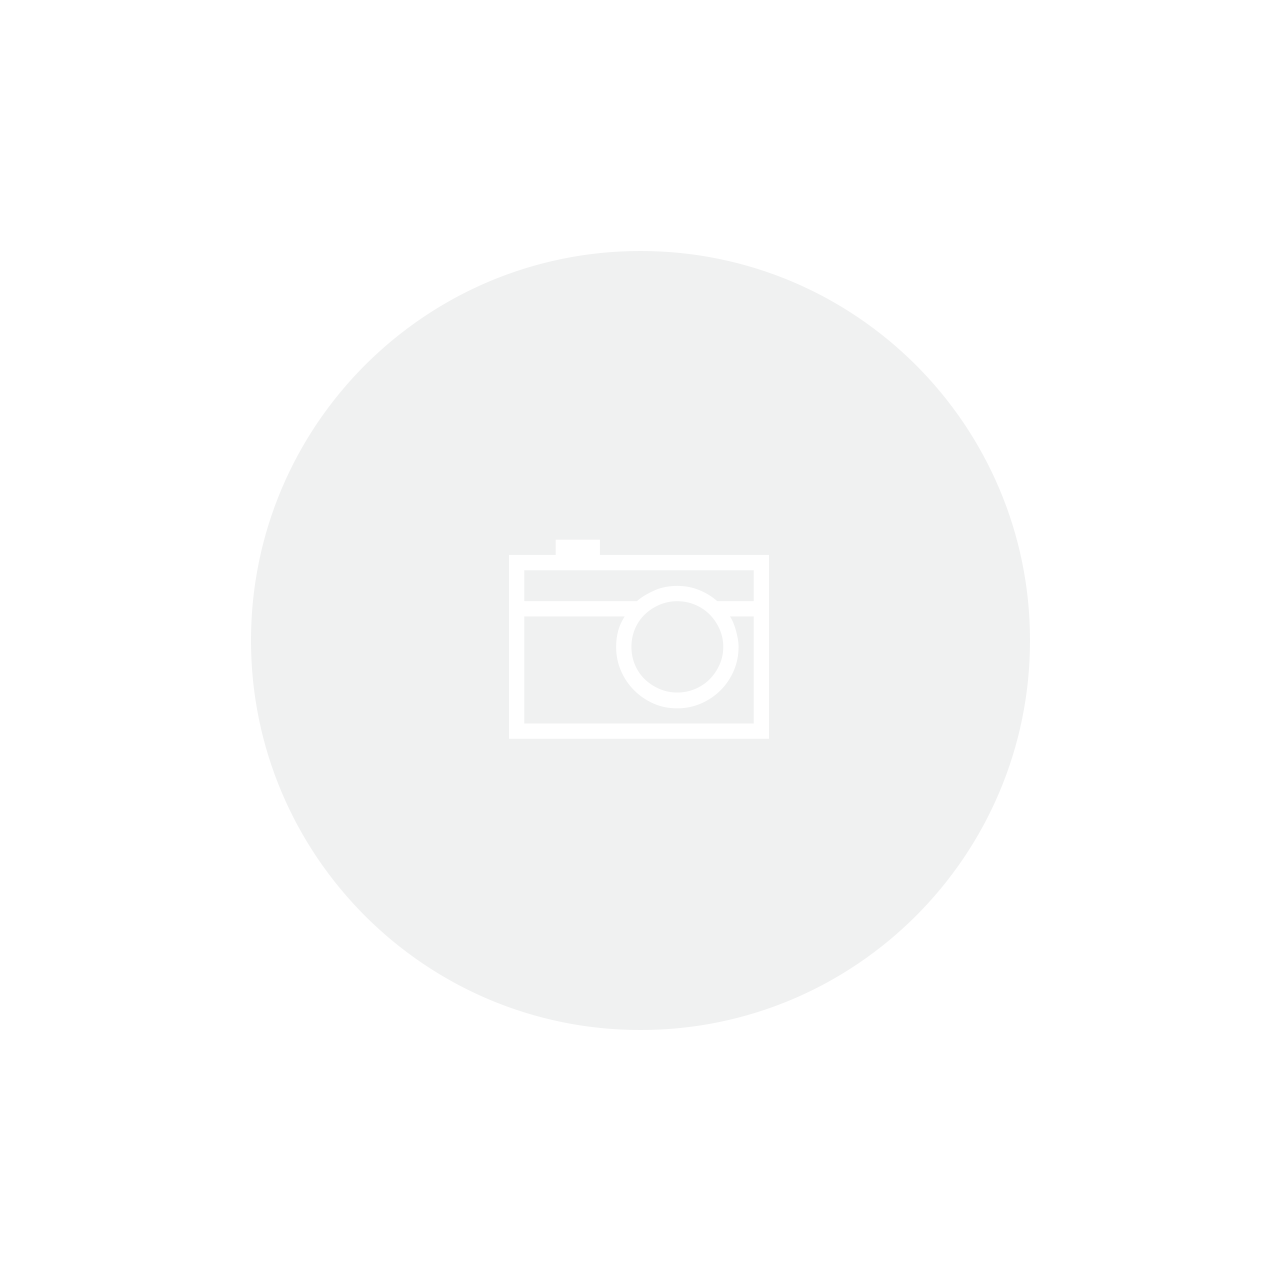 Headset Gamer Corsair HS50 Stereo Carbon CA-9011170-NA